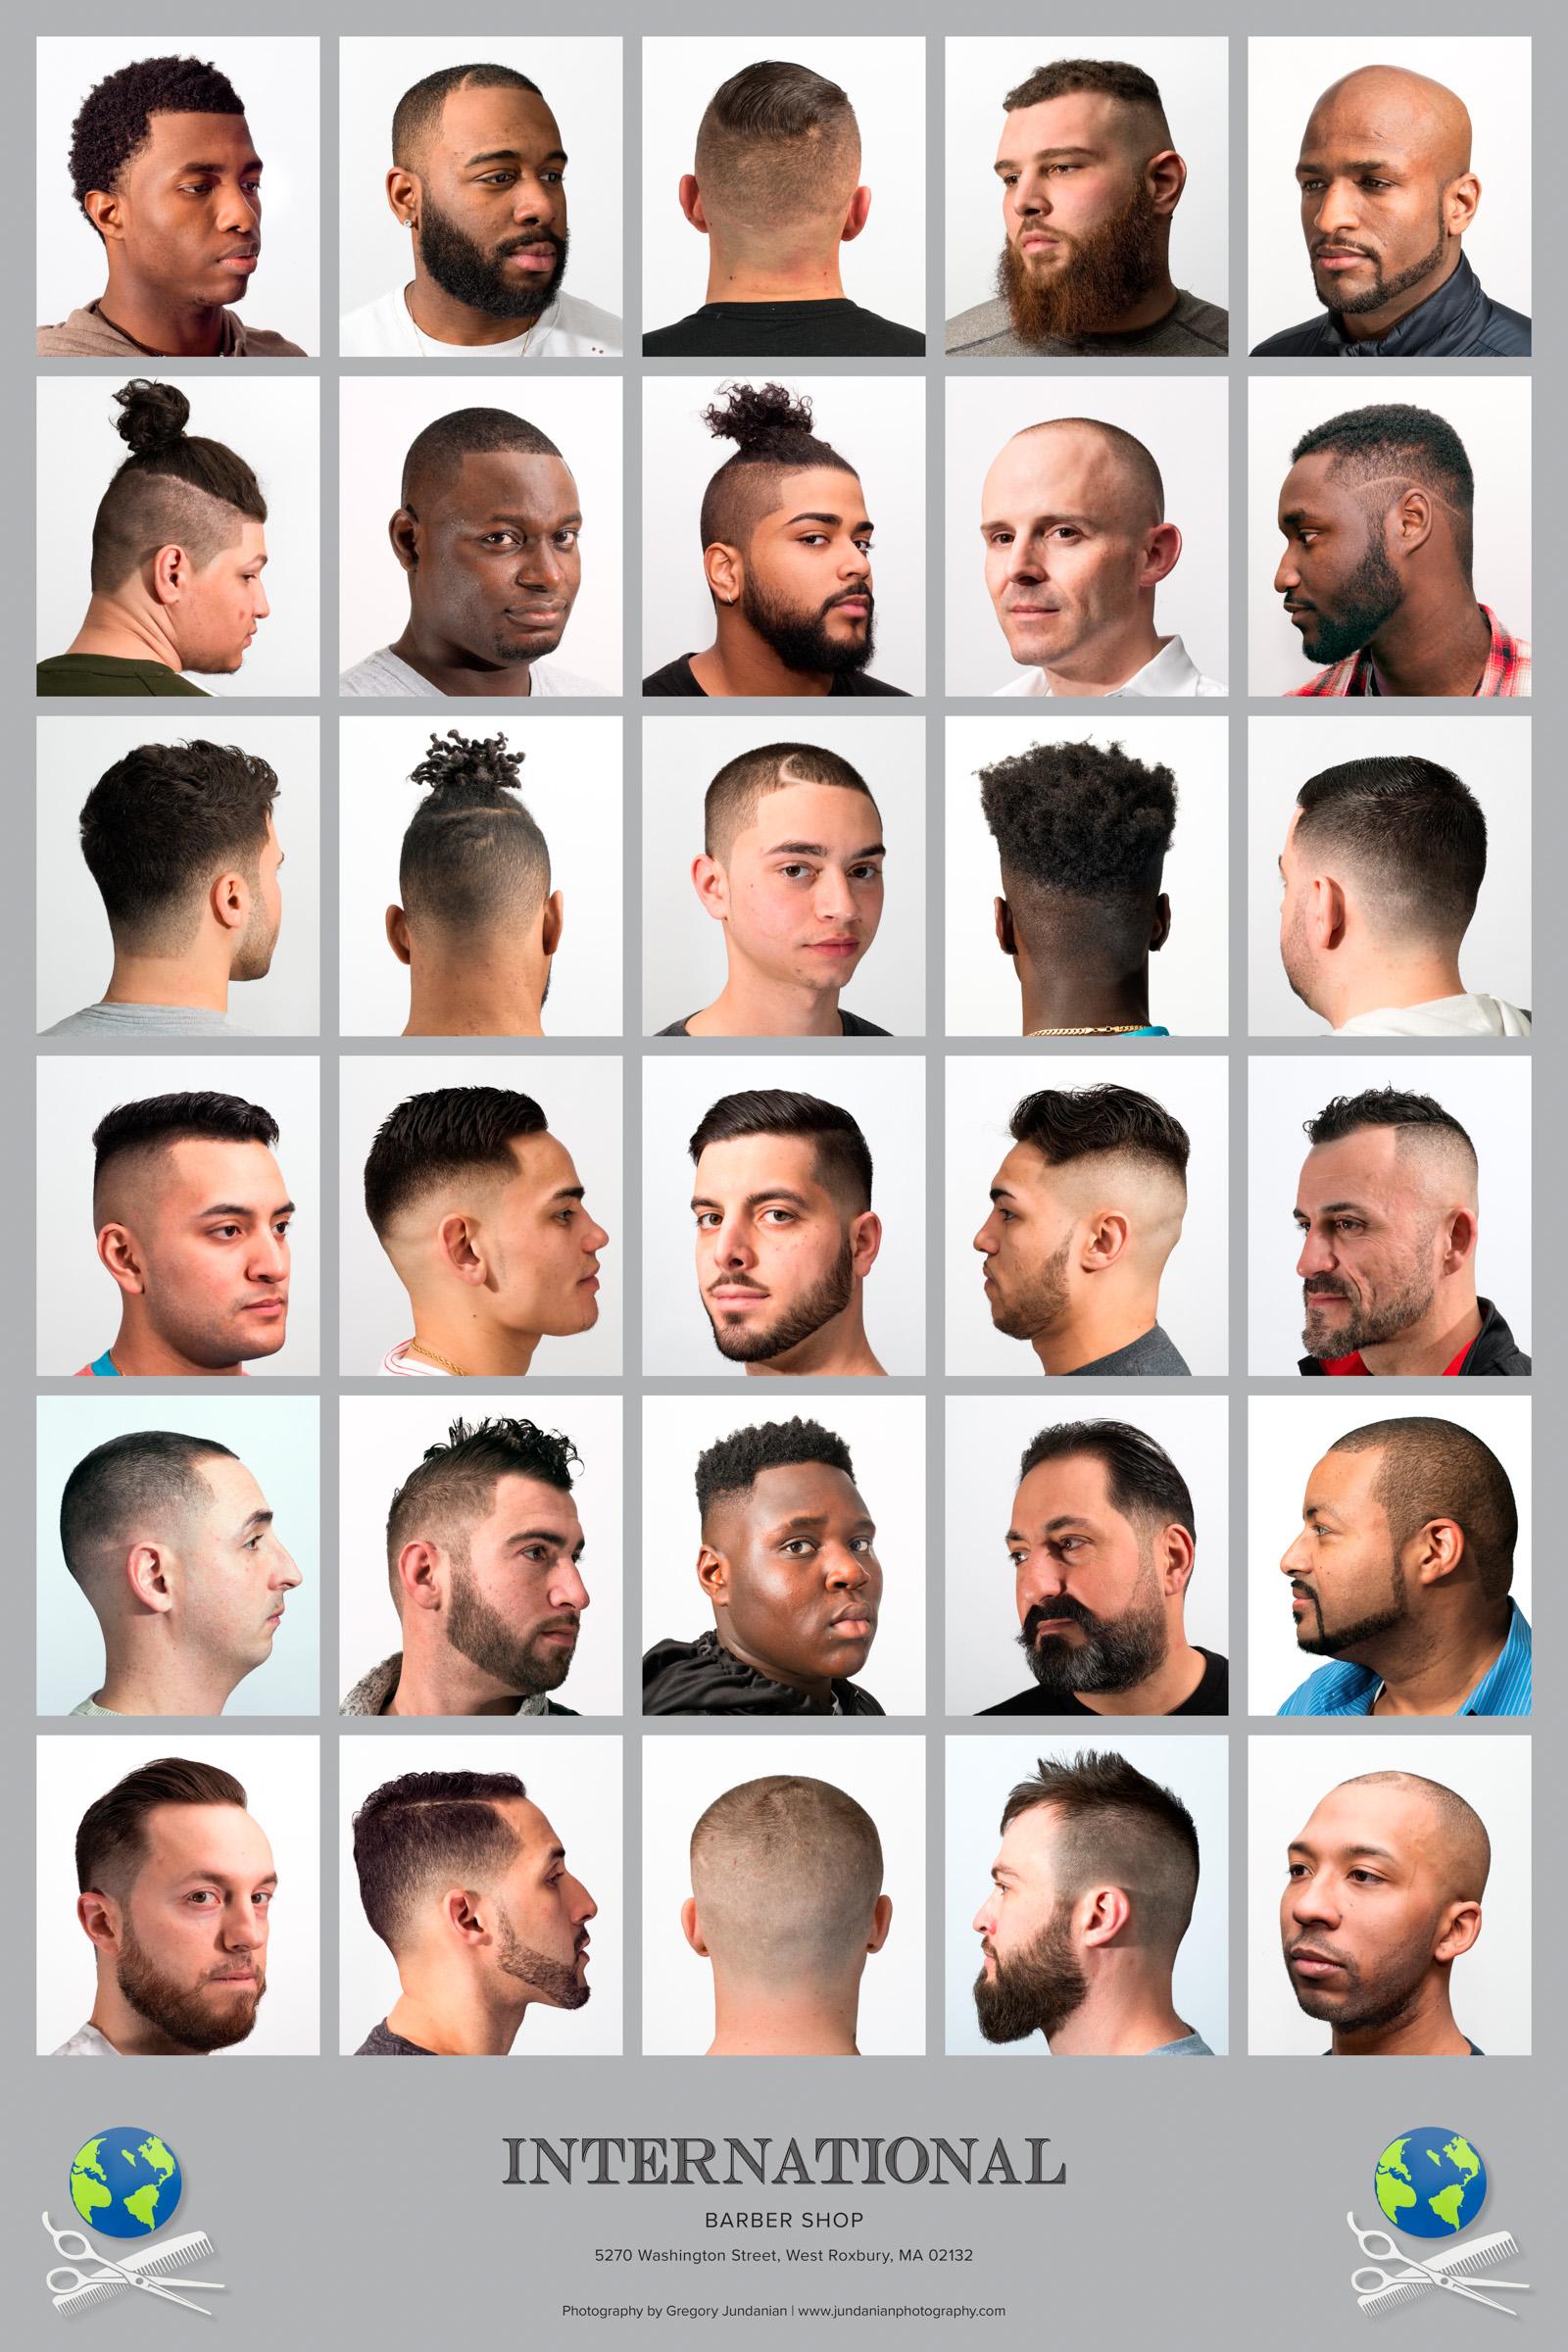 International Barbershop, West Roxbury, MA